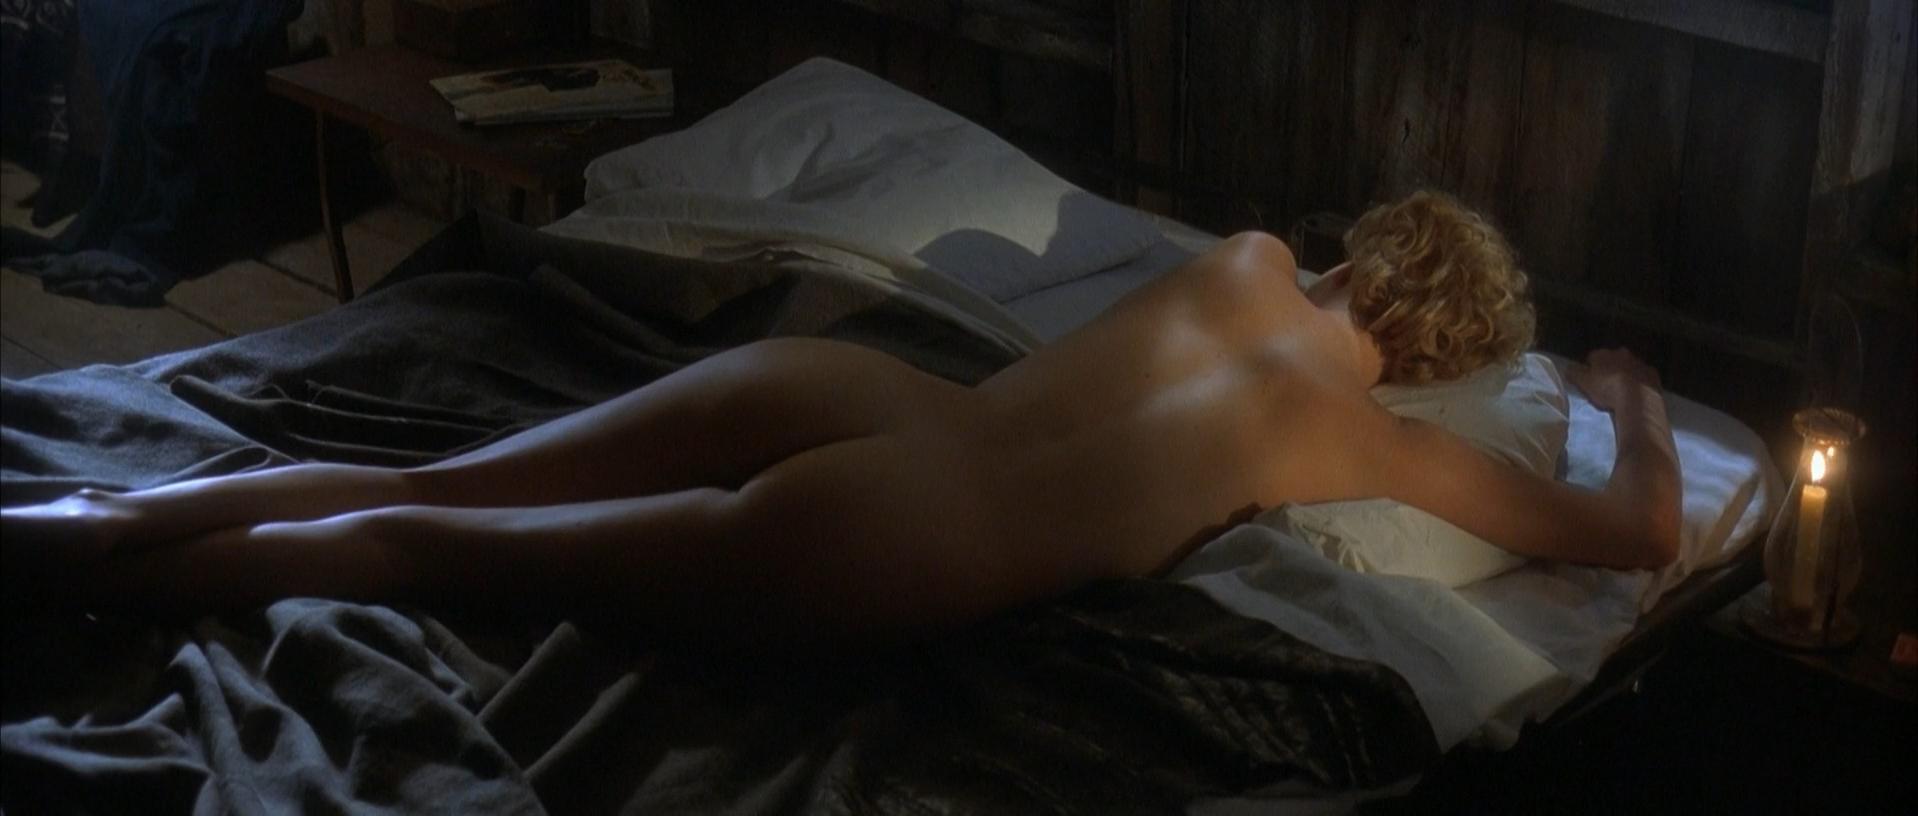 Fake naked charlize theron nude